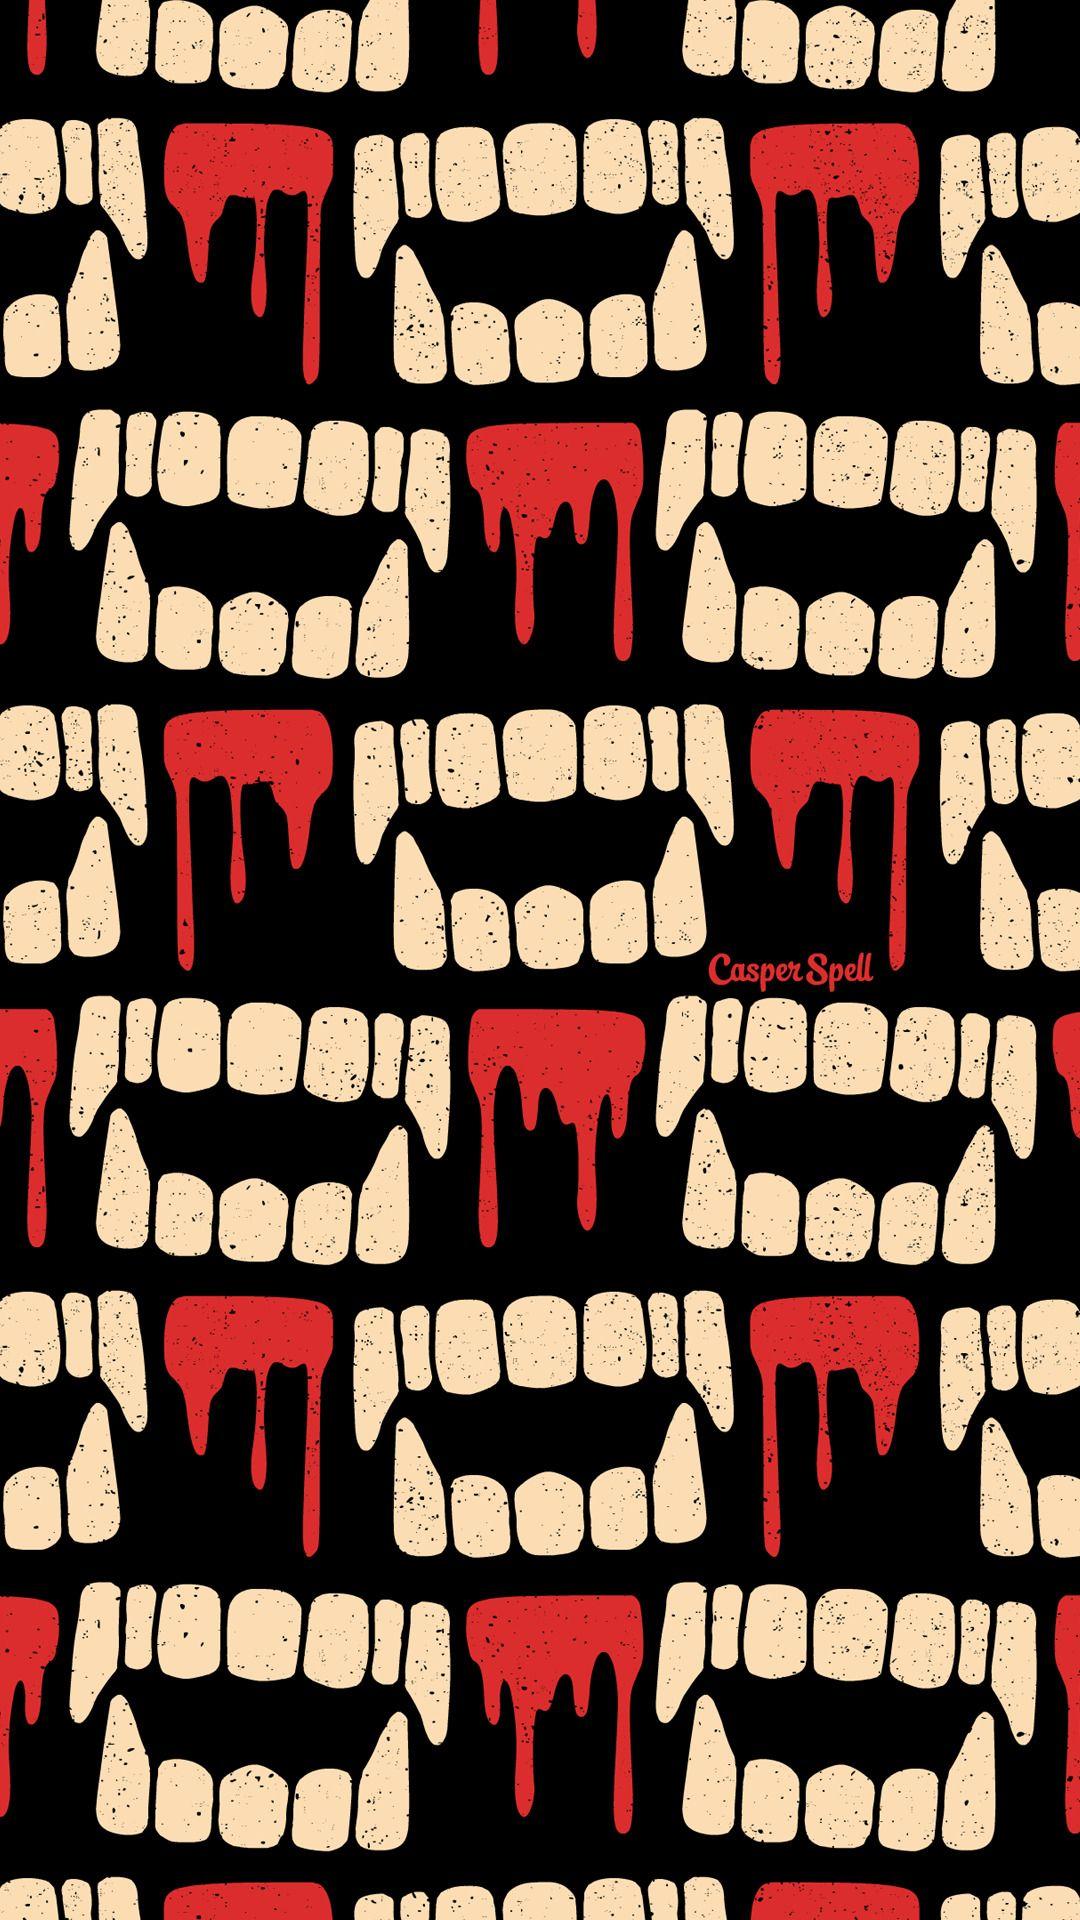 Pin By U G L Y On Skull Halloween Wallpaper Lock Screen Wallpaper Iphone Wallpapers Vintage